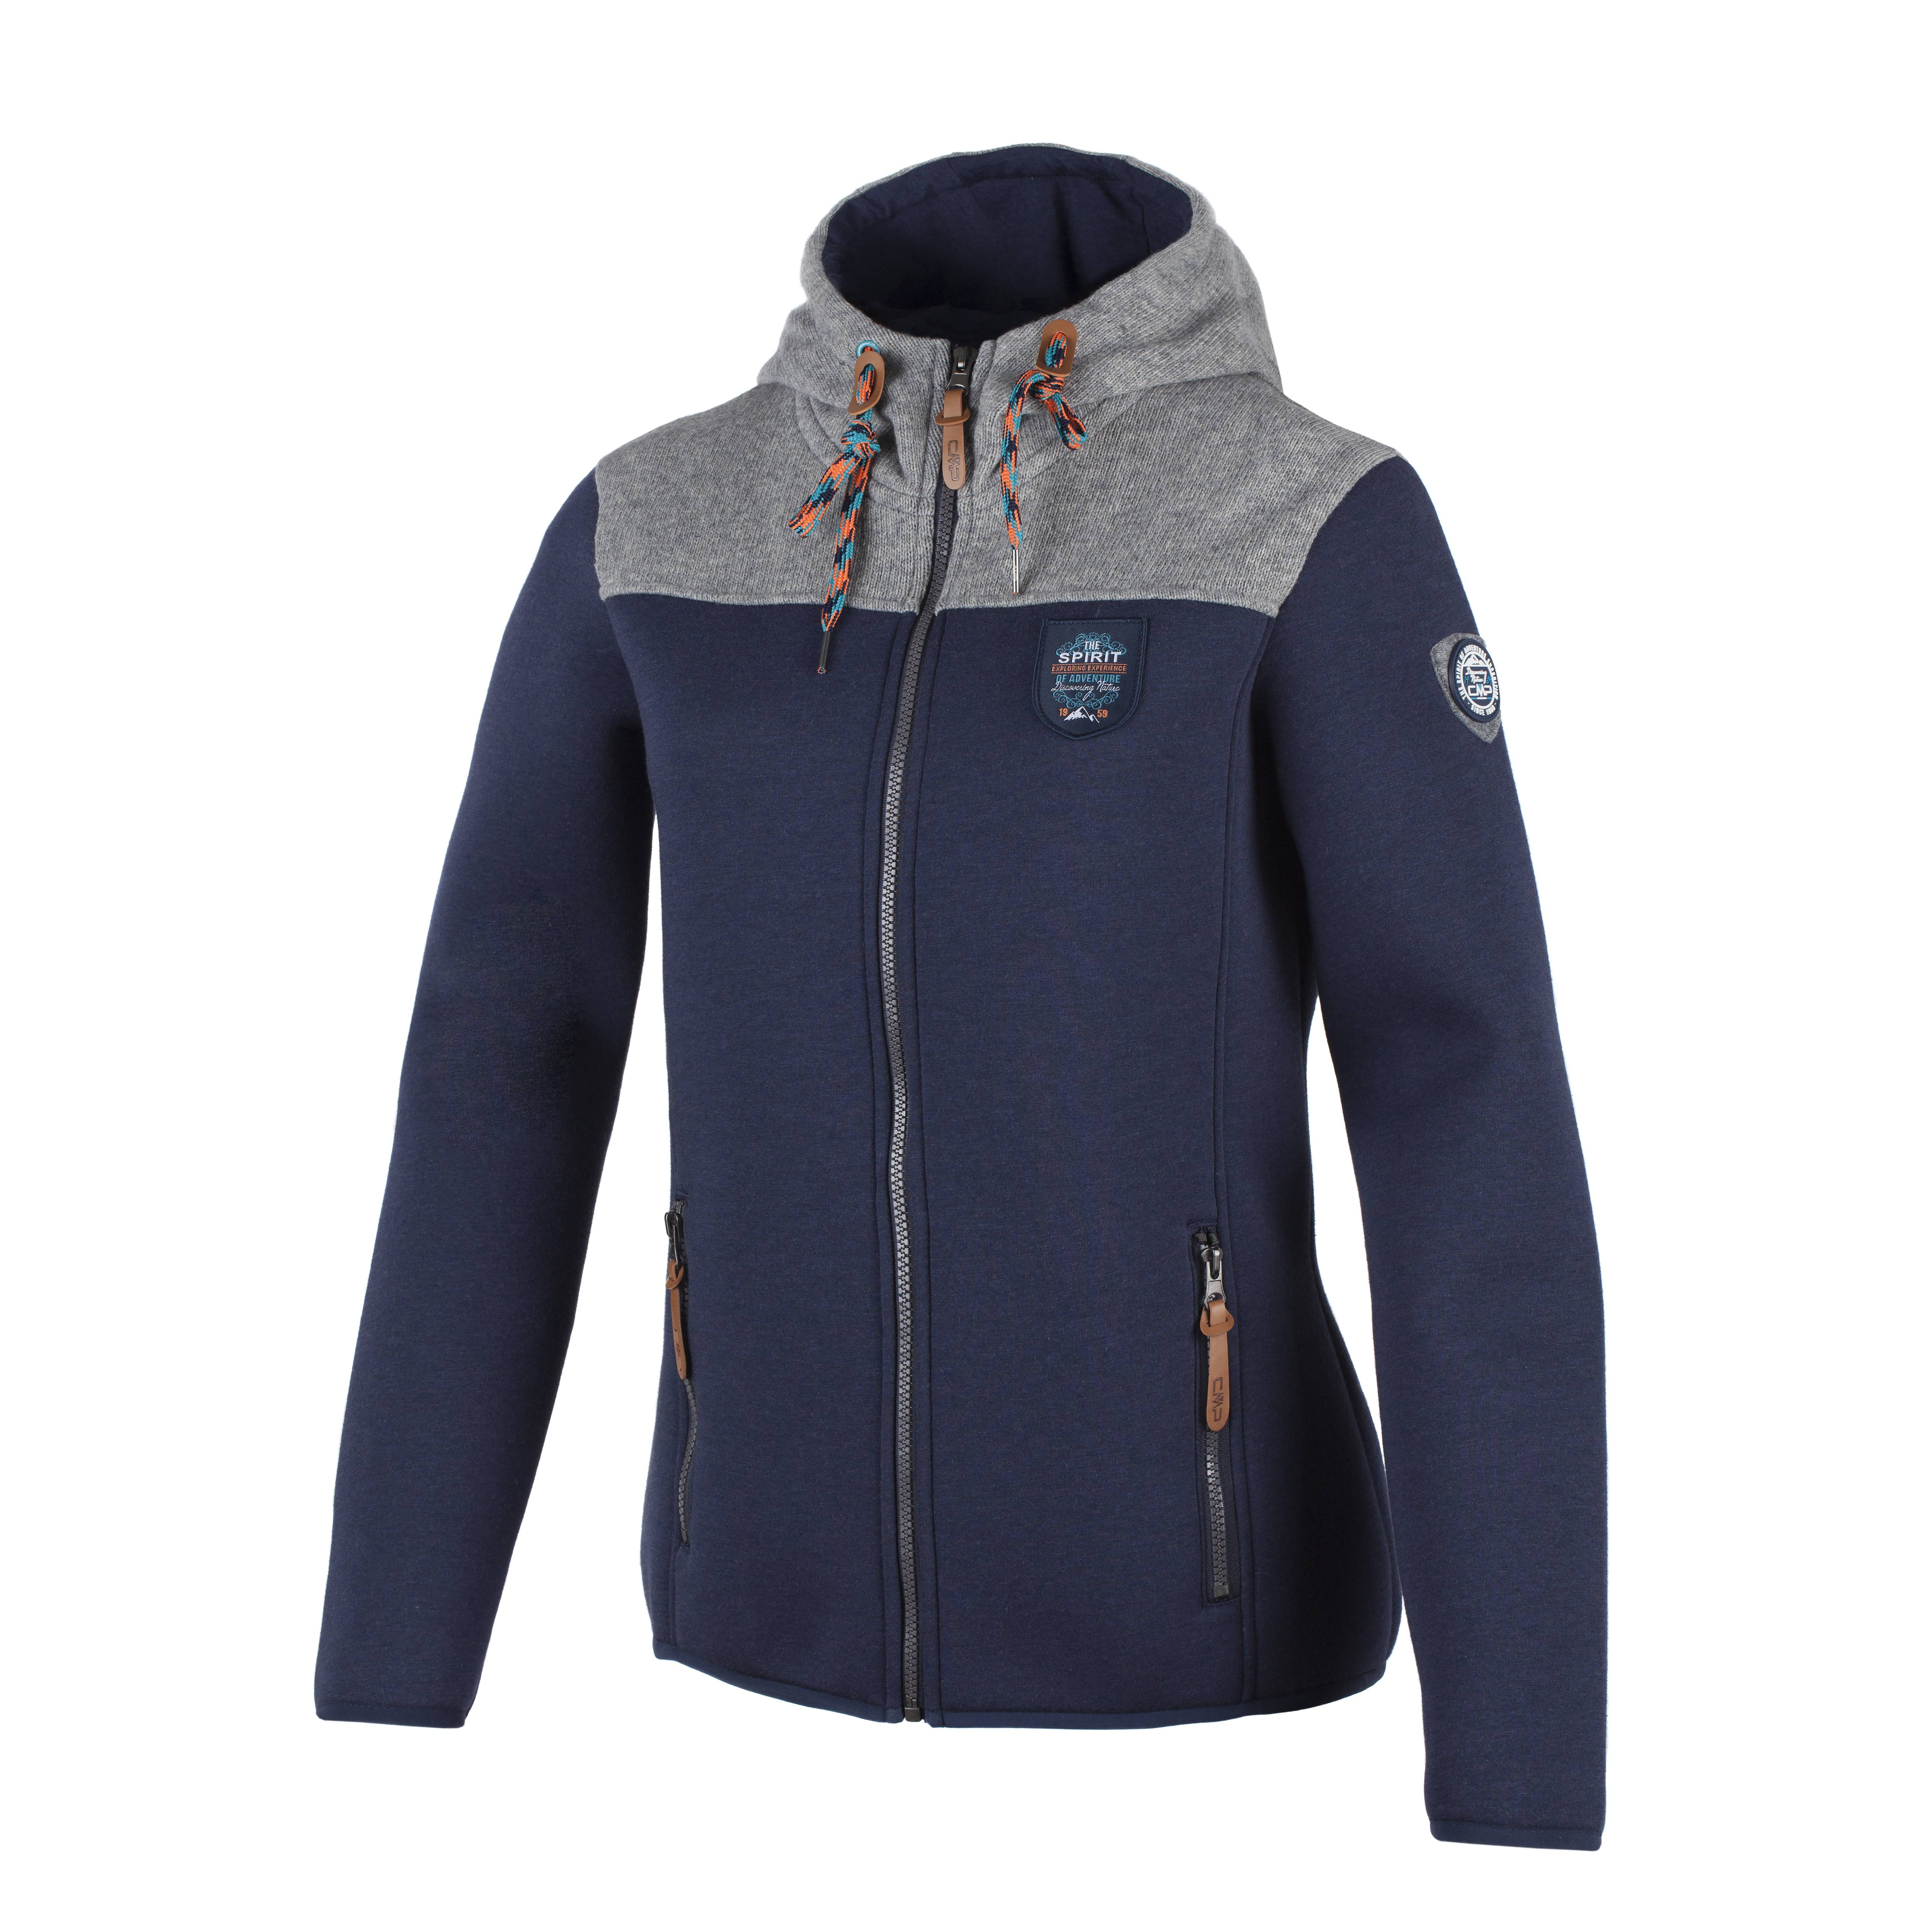 CMP-chaqueta-polar-de-entretiempo-funcional-Blau-SUPER-LIGERO-calido